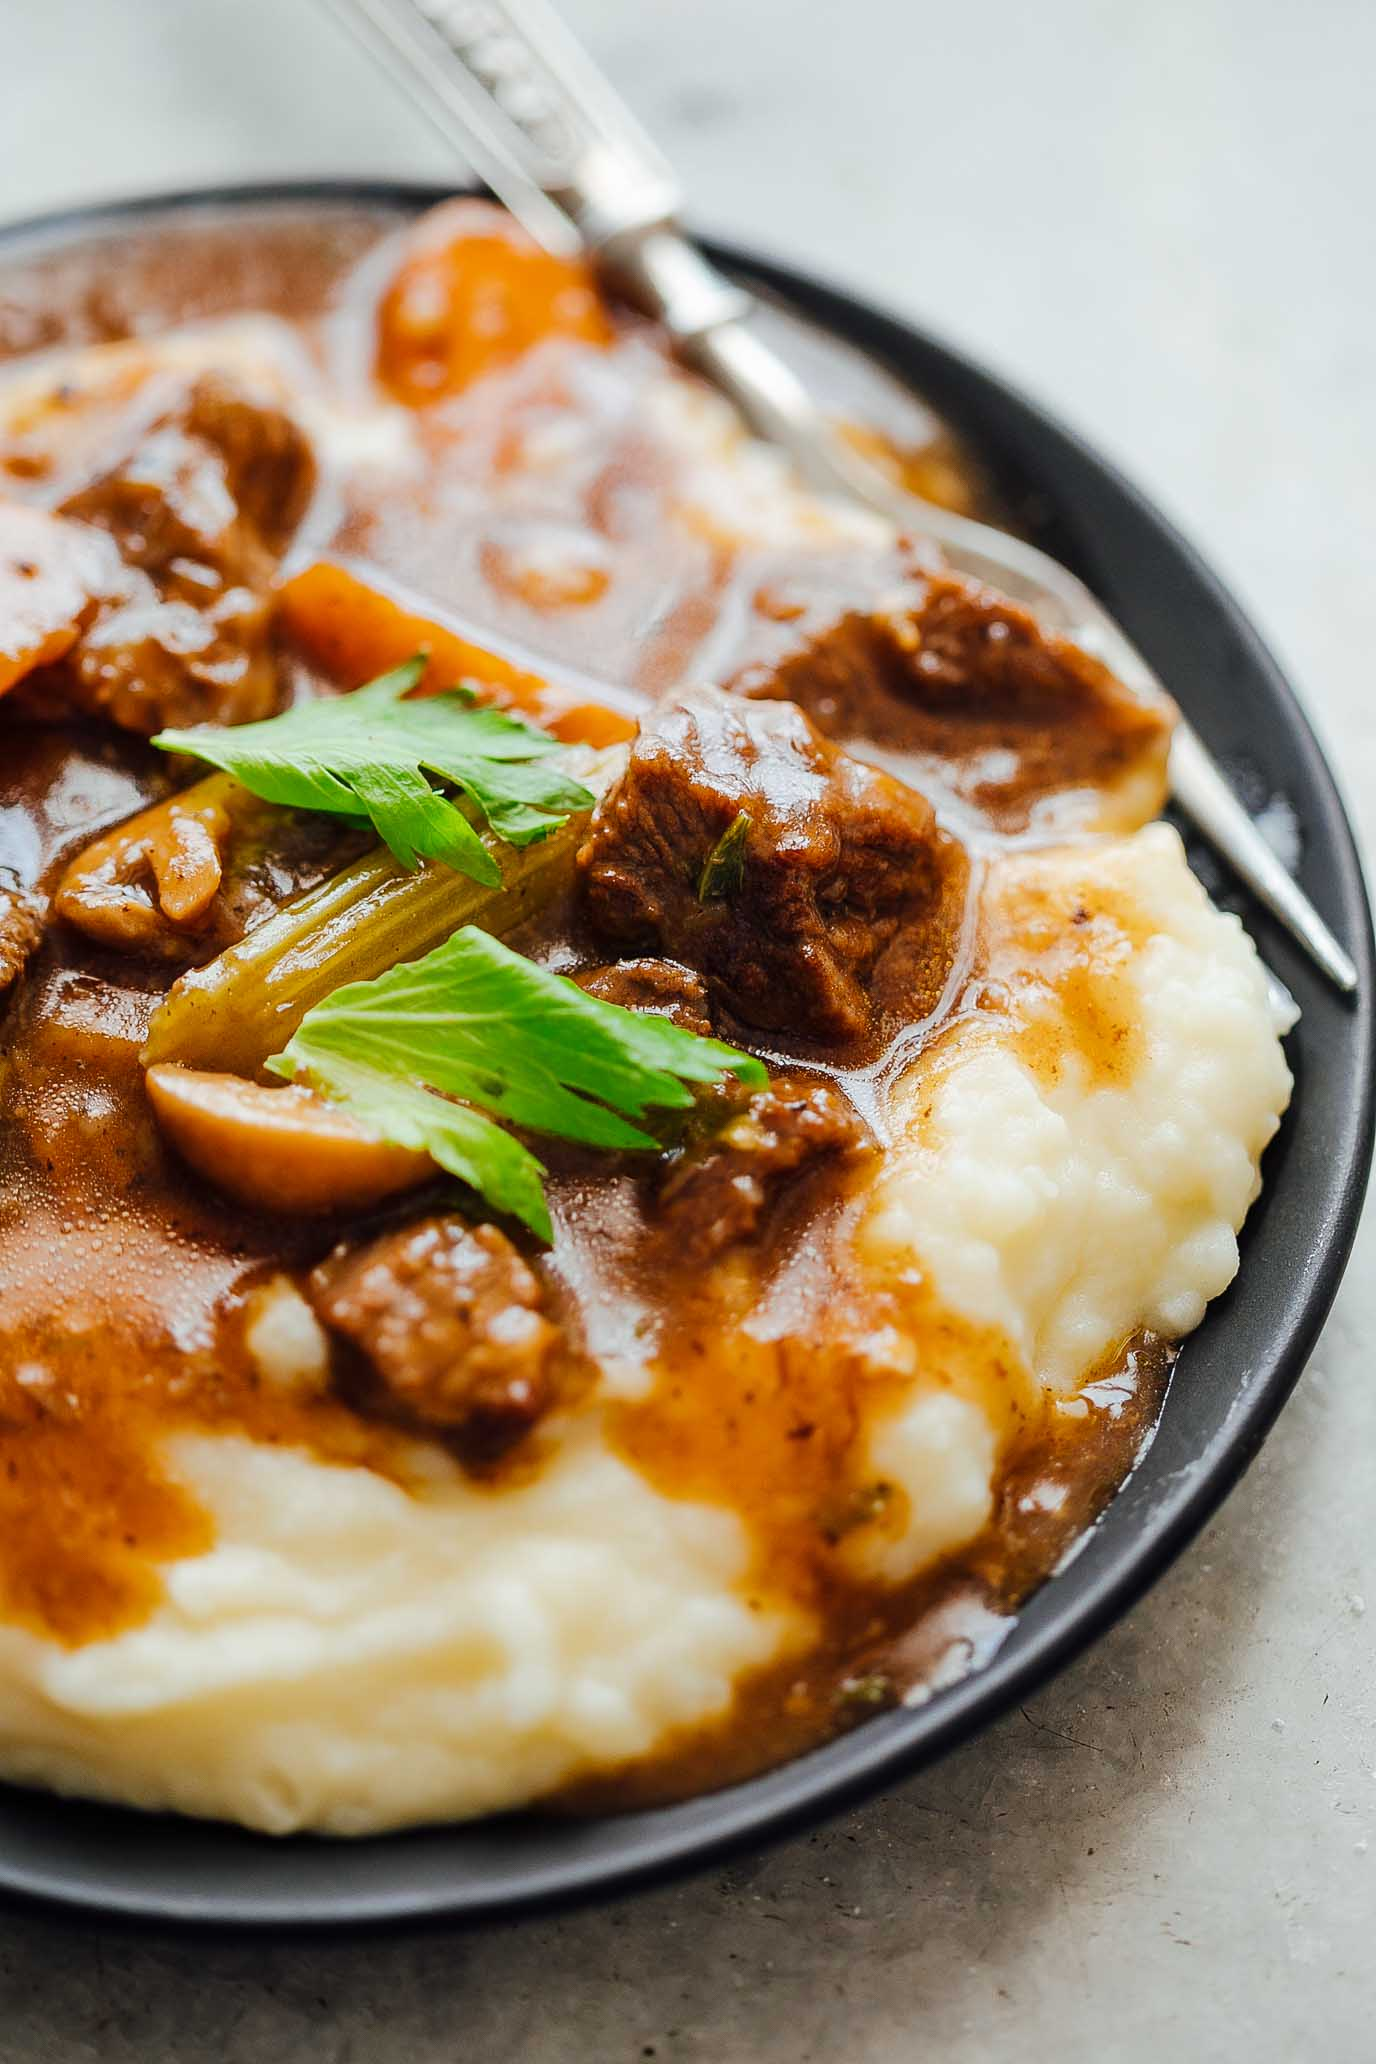 Easy-Instant-Pot-Beef-Stew-Pressure-Cooker-Recipe-4.jpg